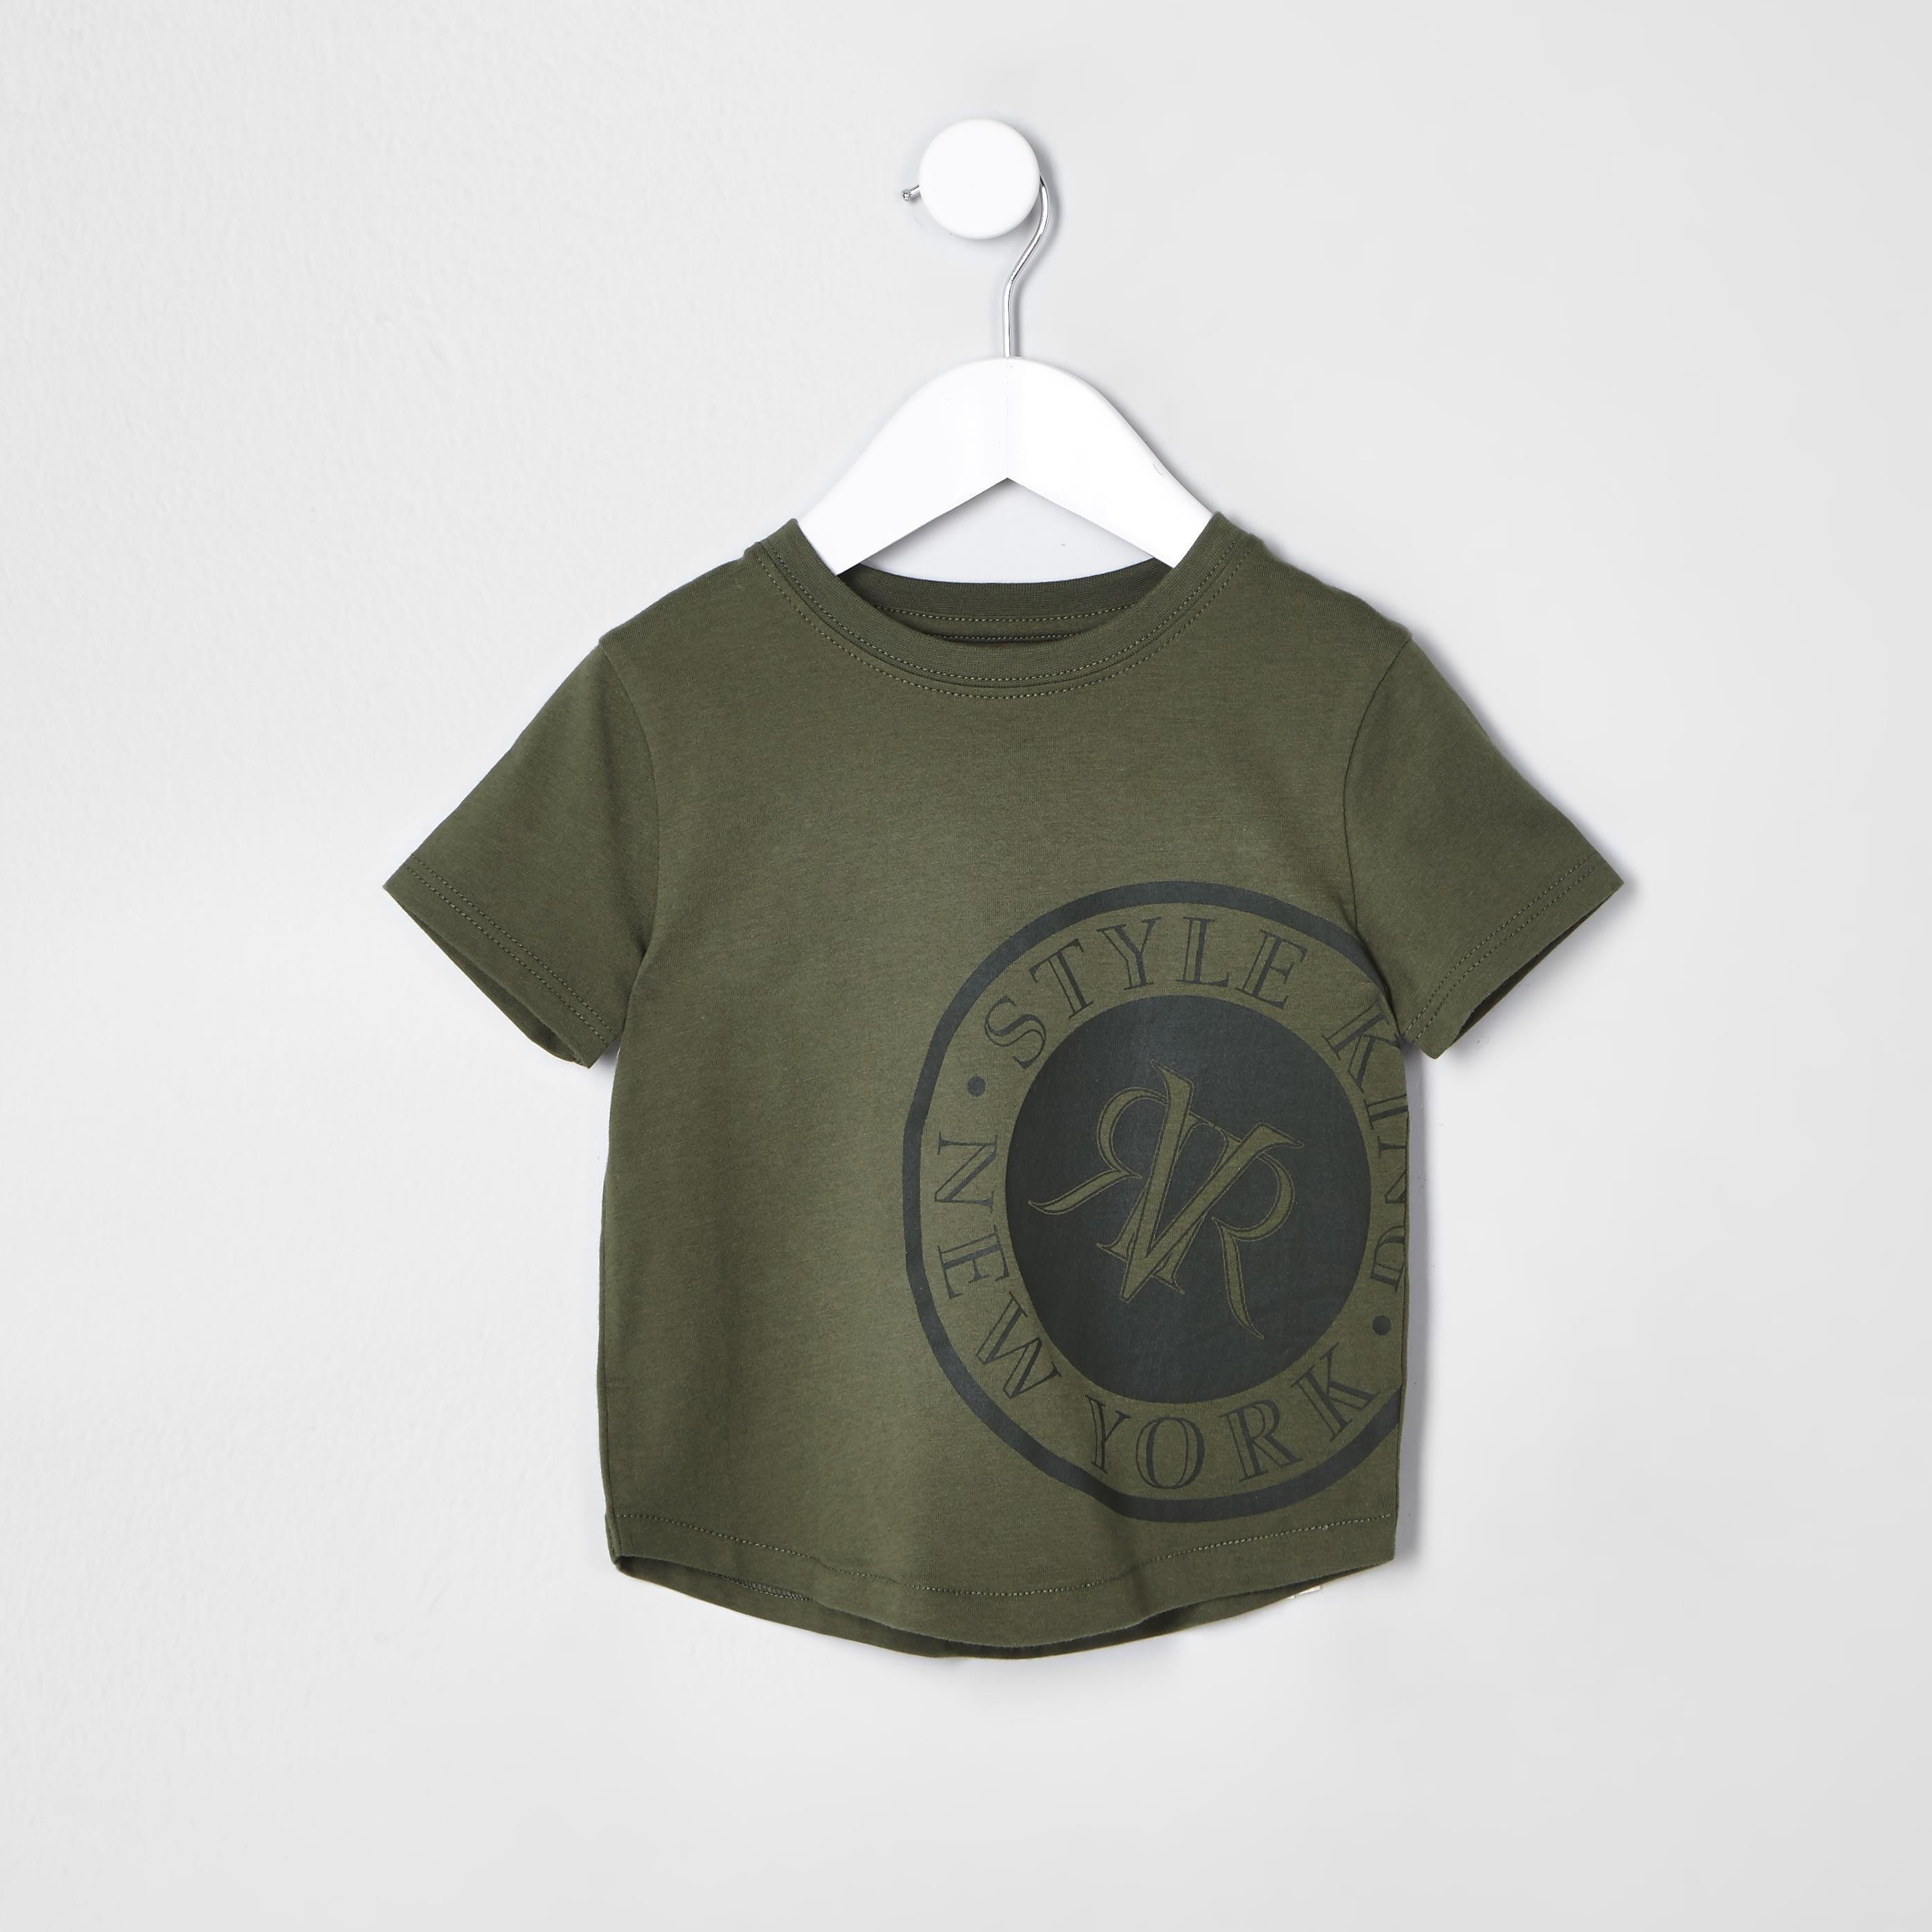 River Island Mens Baby Boys Khaki 'New York' T-shirt (9-12 Mths)